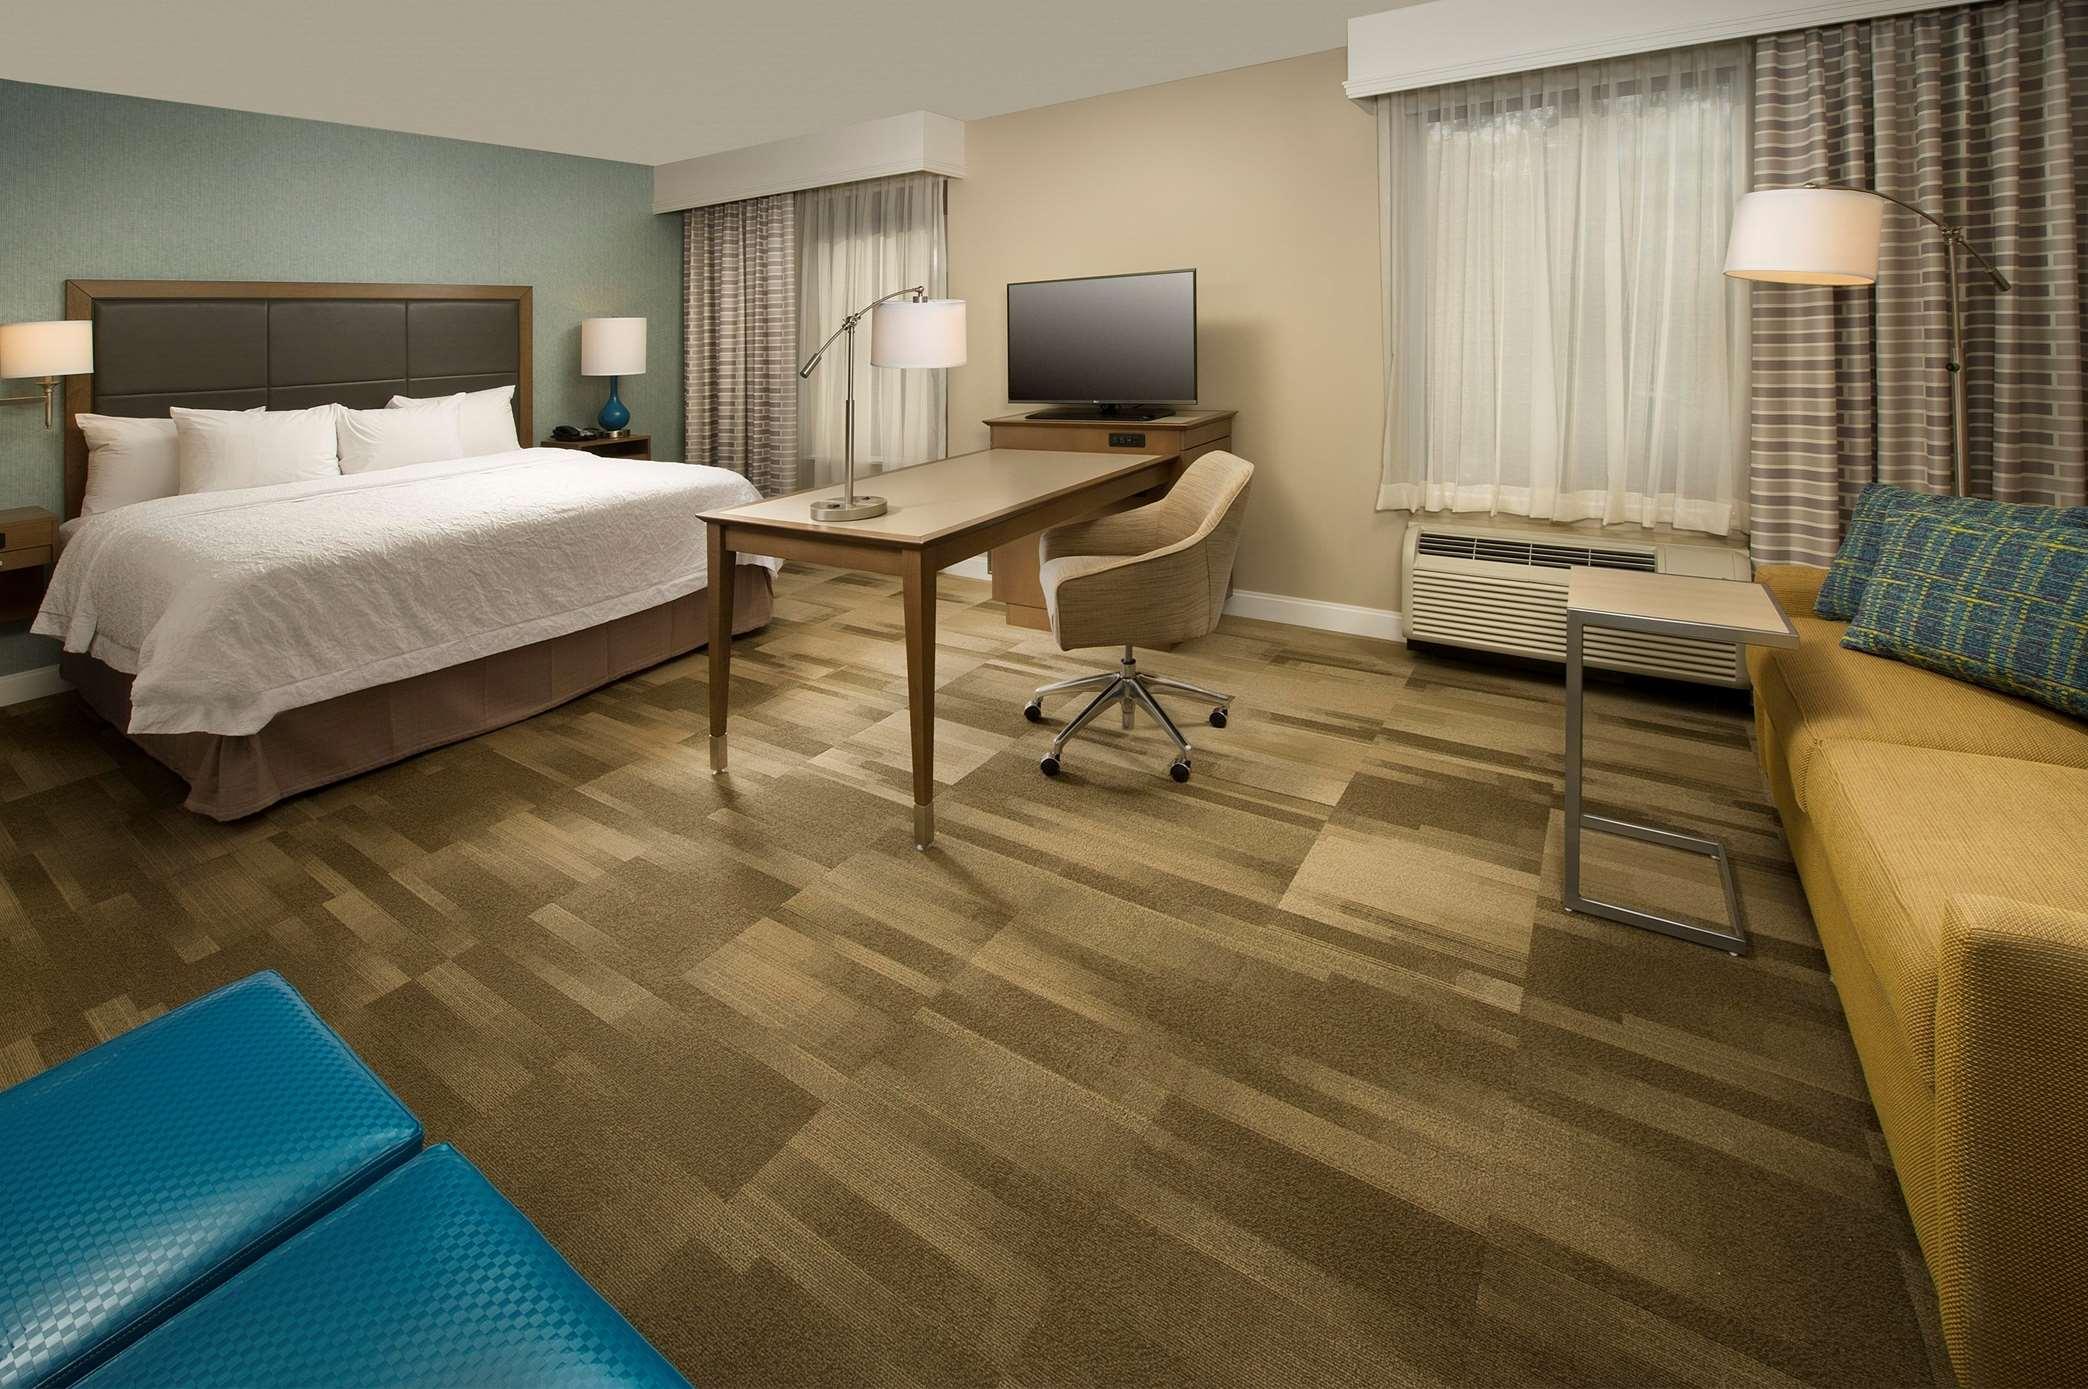 Hampton Inn & Suites Syracuse/Carrier Circle image 11